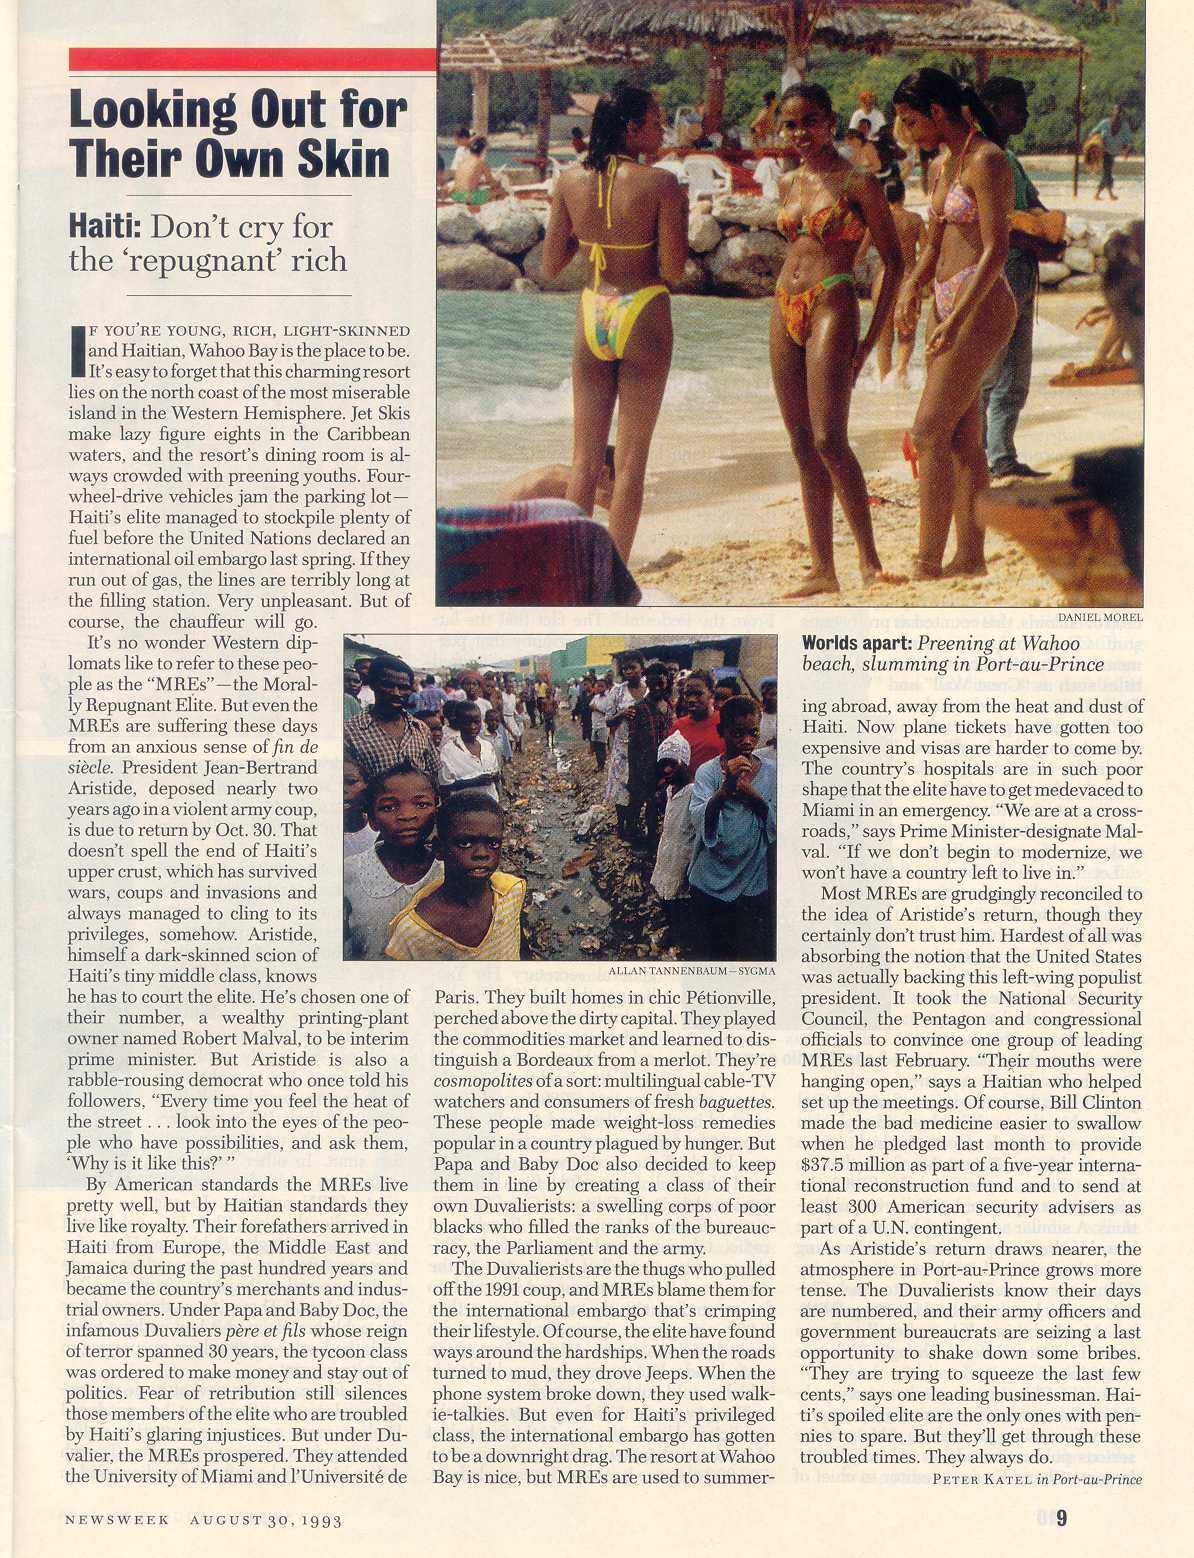 katel newsweek haiti